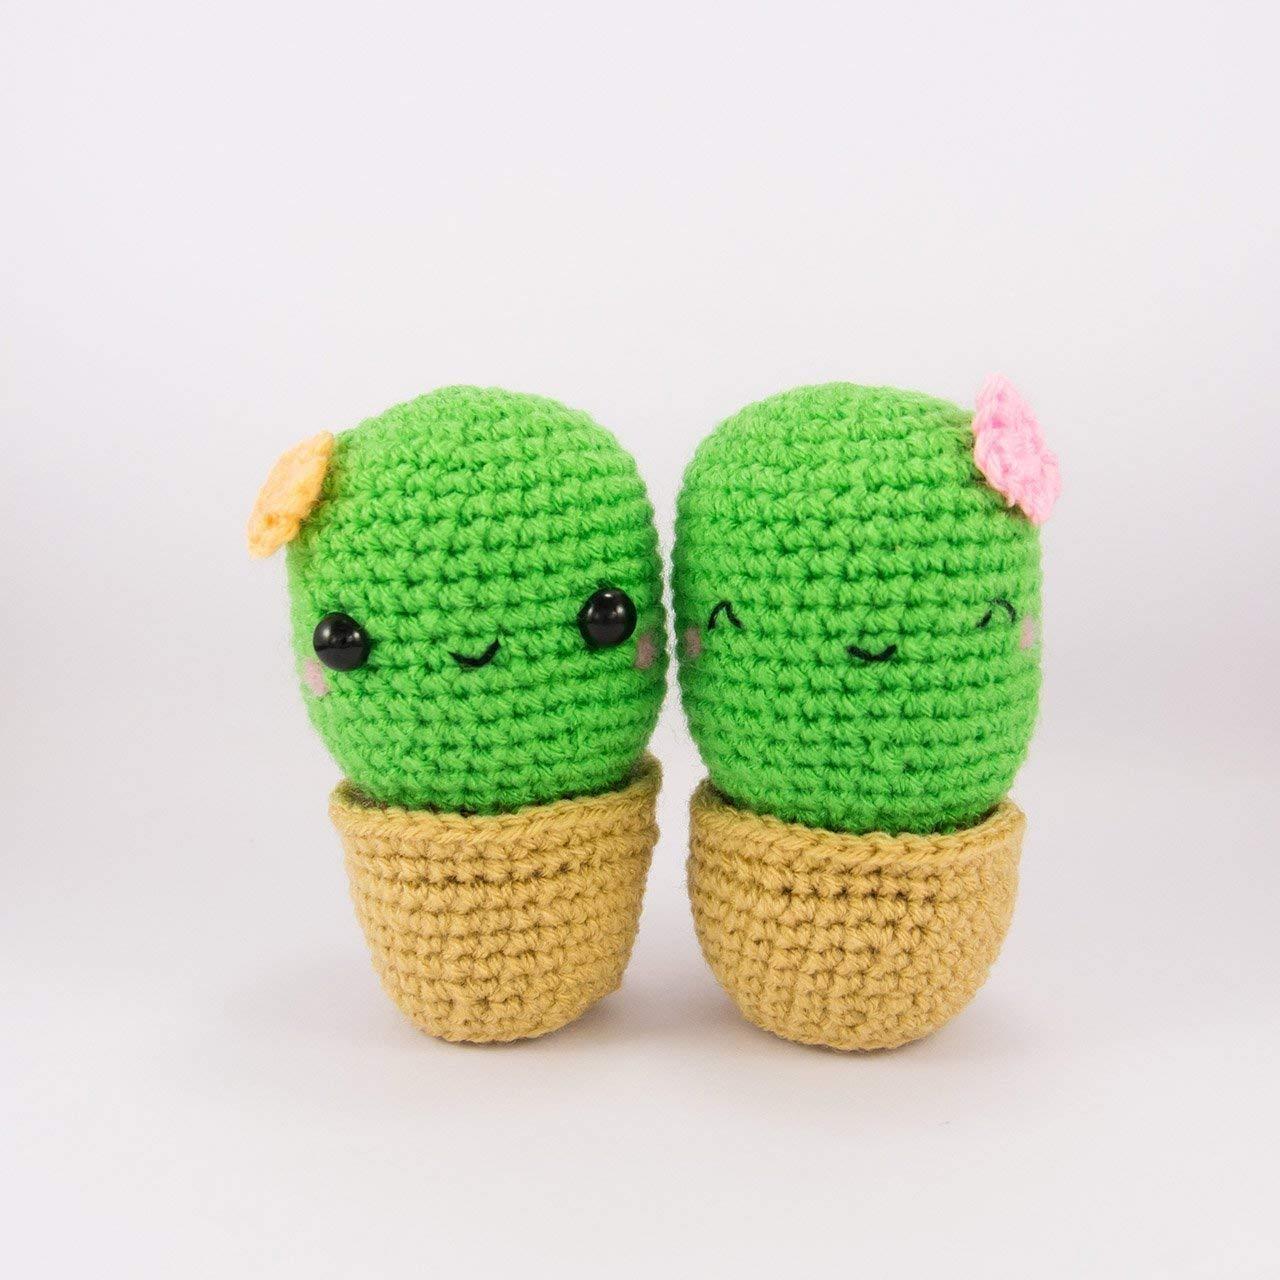 Crochet Cactus - Airali   1280x1280